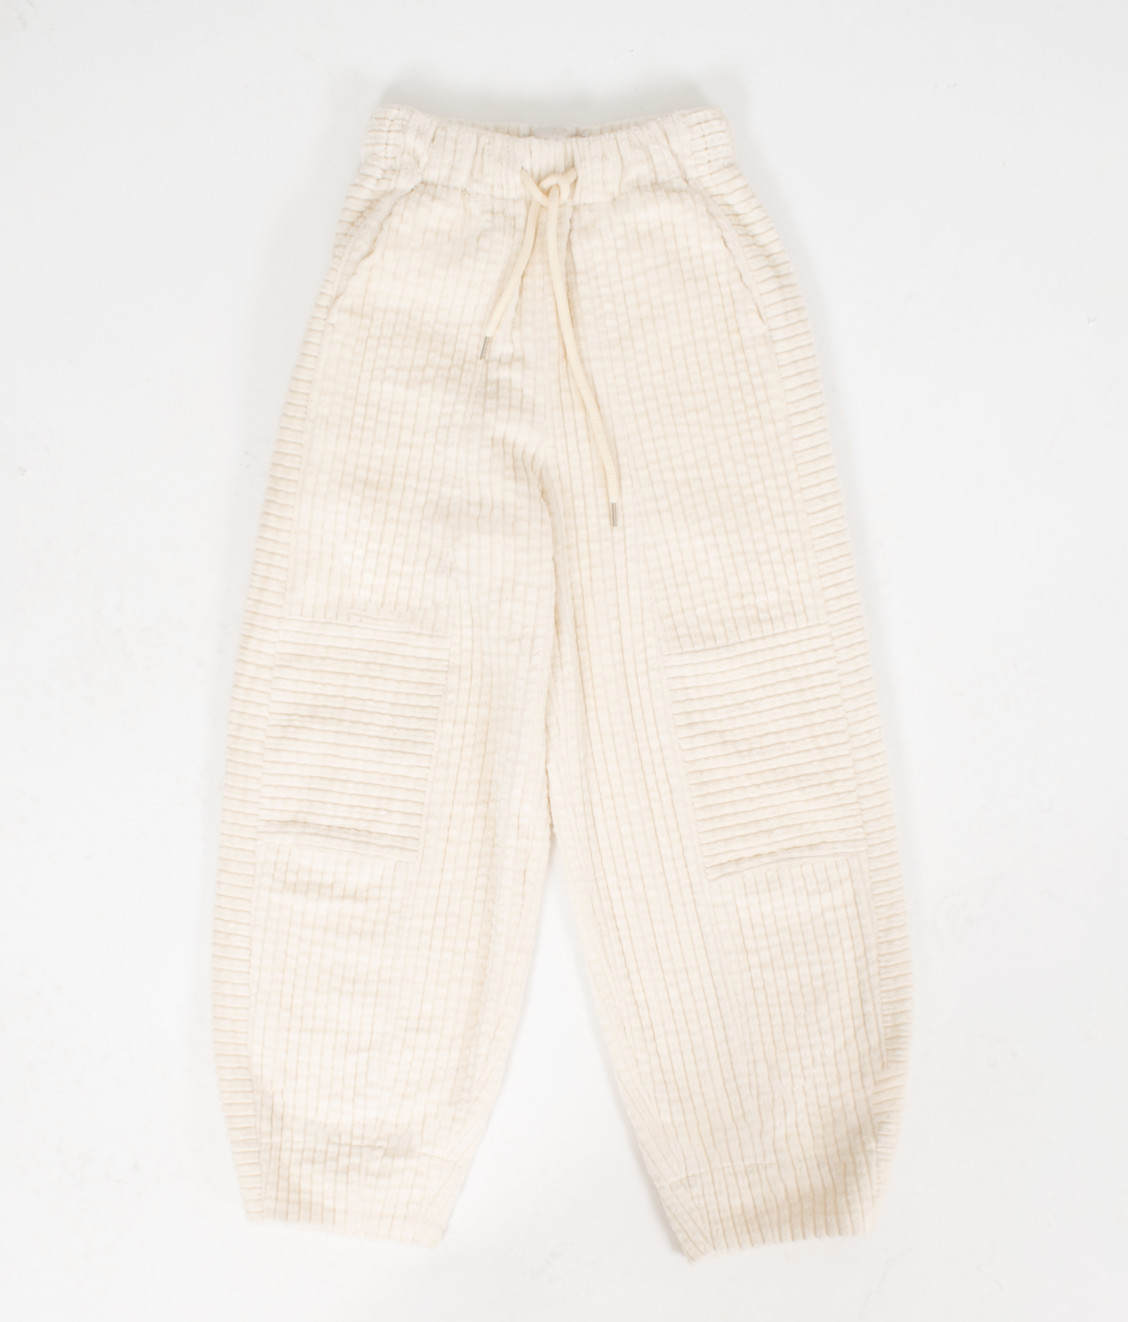 NEUL Neul Bold Corduroy Comfy Pants Pearled Ivory